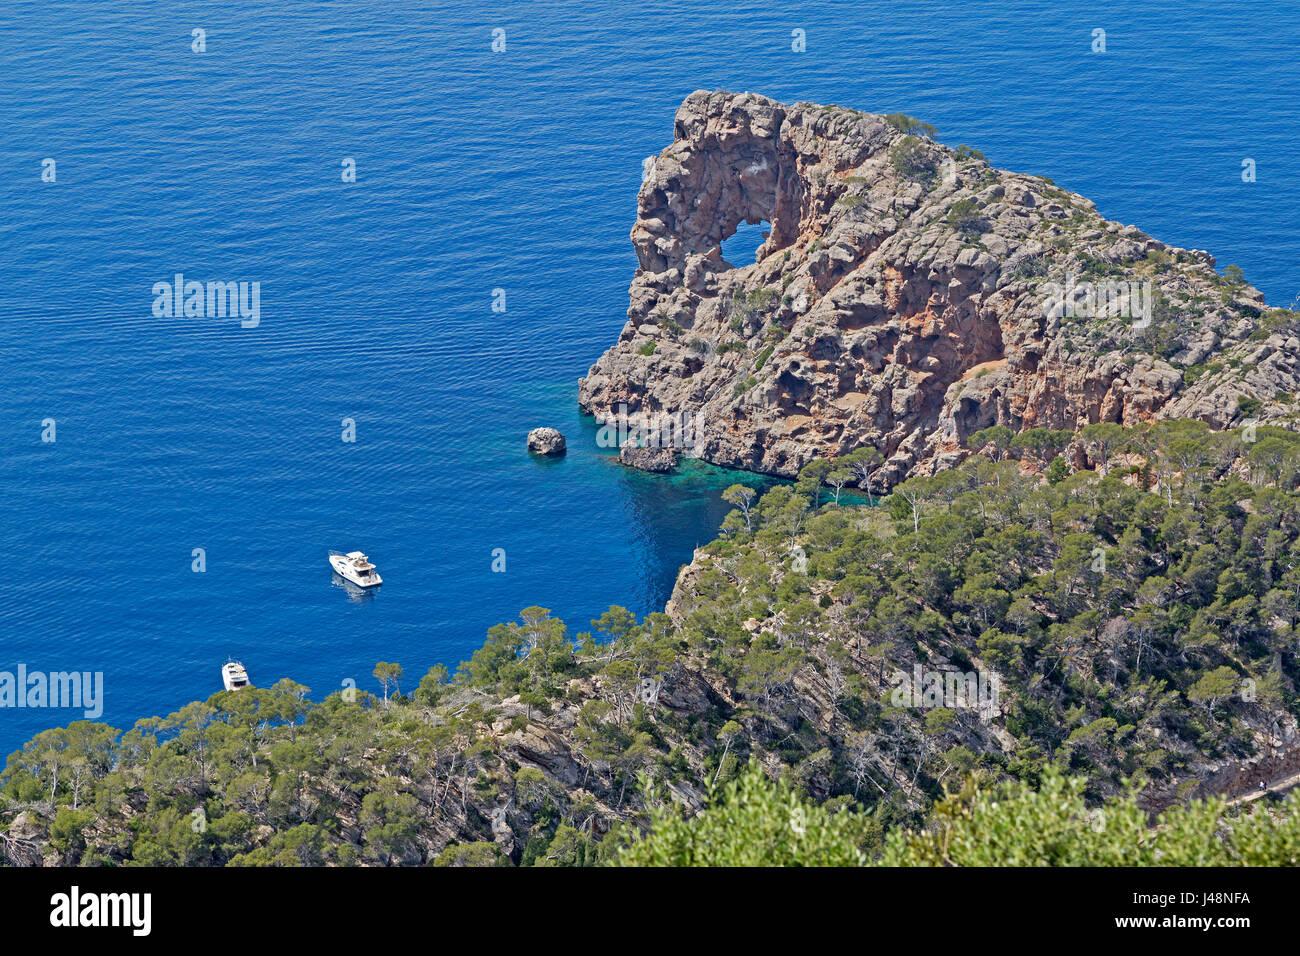 Sa Foradada Peninsula near Son Marroig, Majorca, Spain - Stock Image